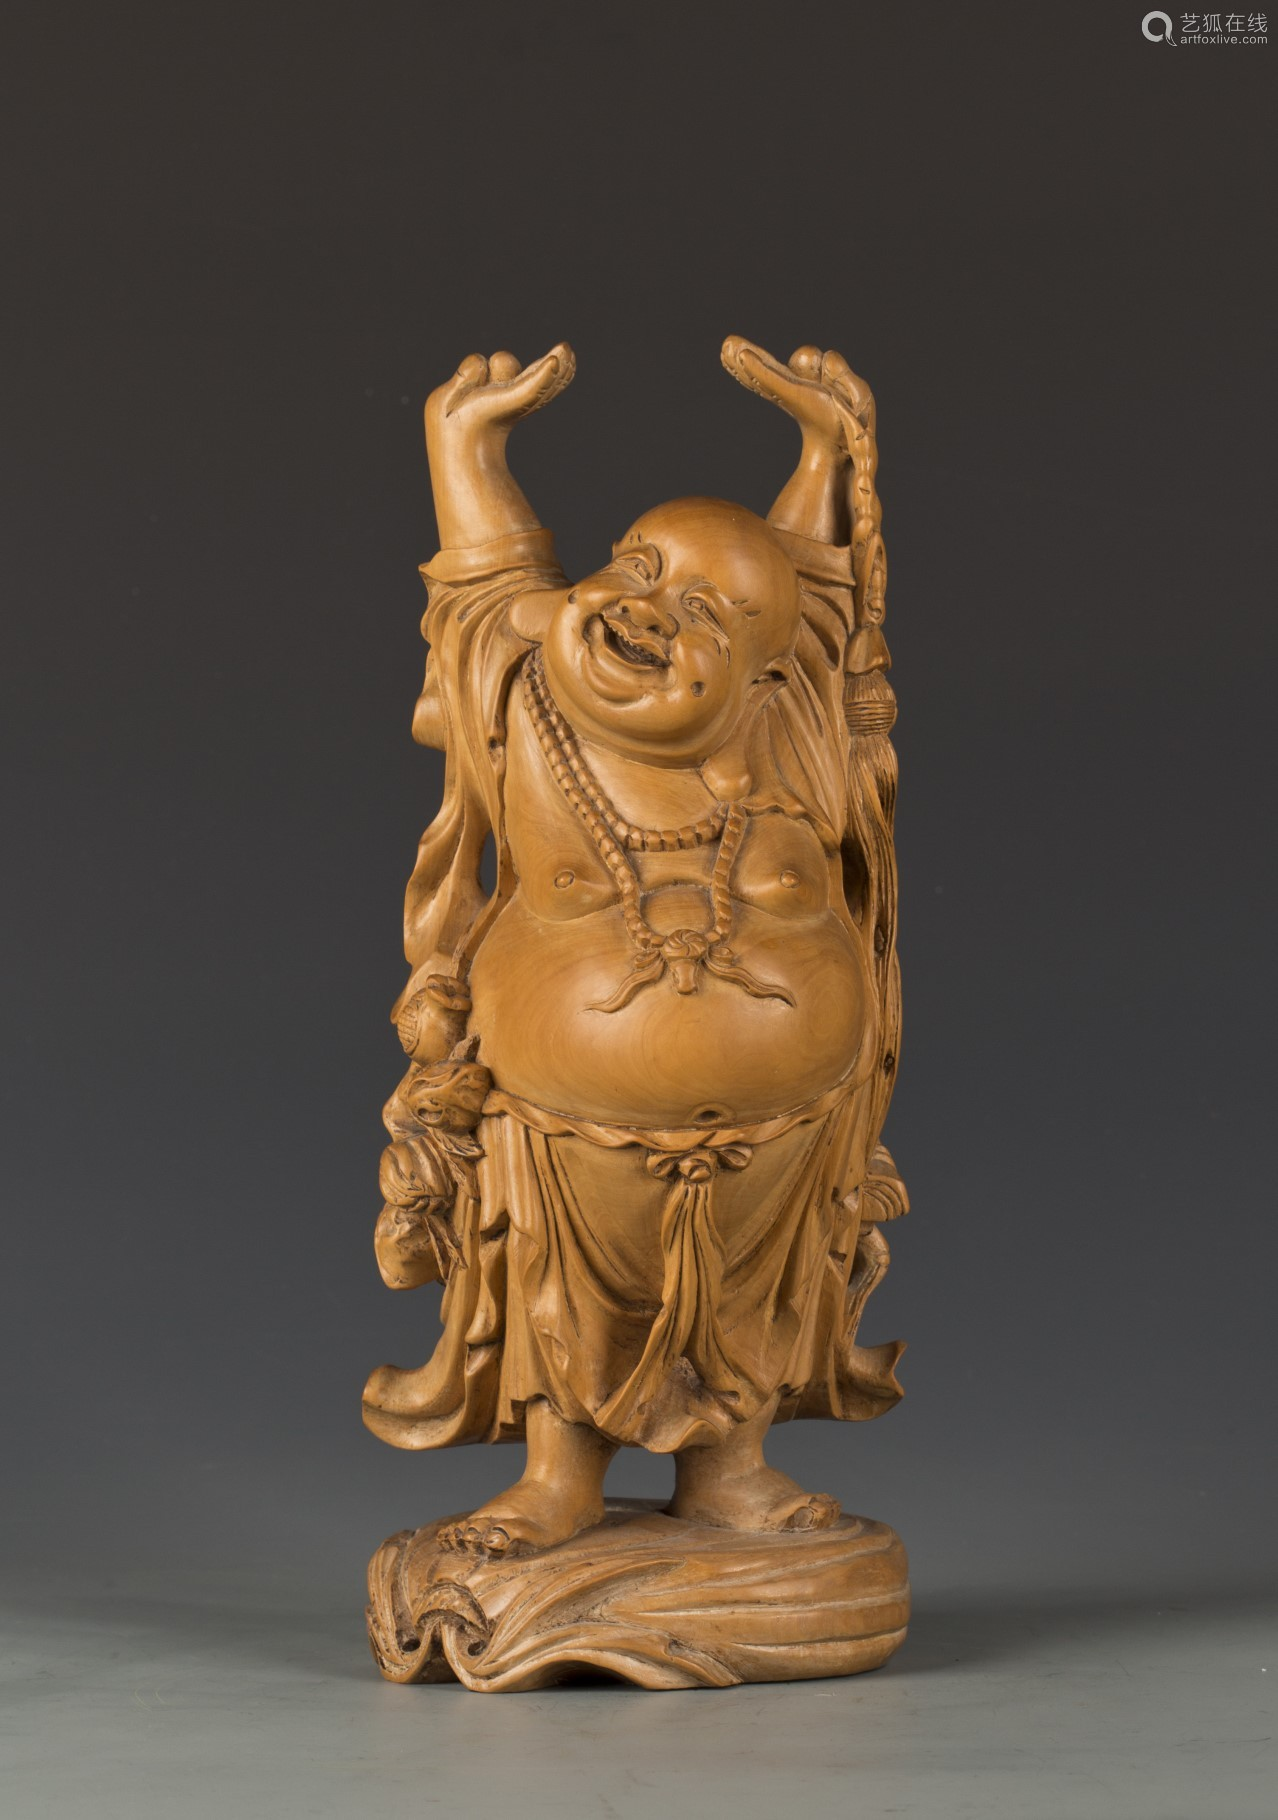 A boxwood maitreya sculpture-artfoxlive